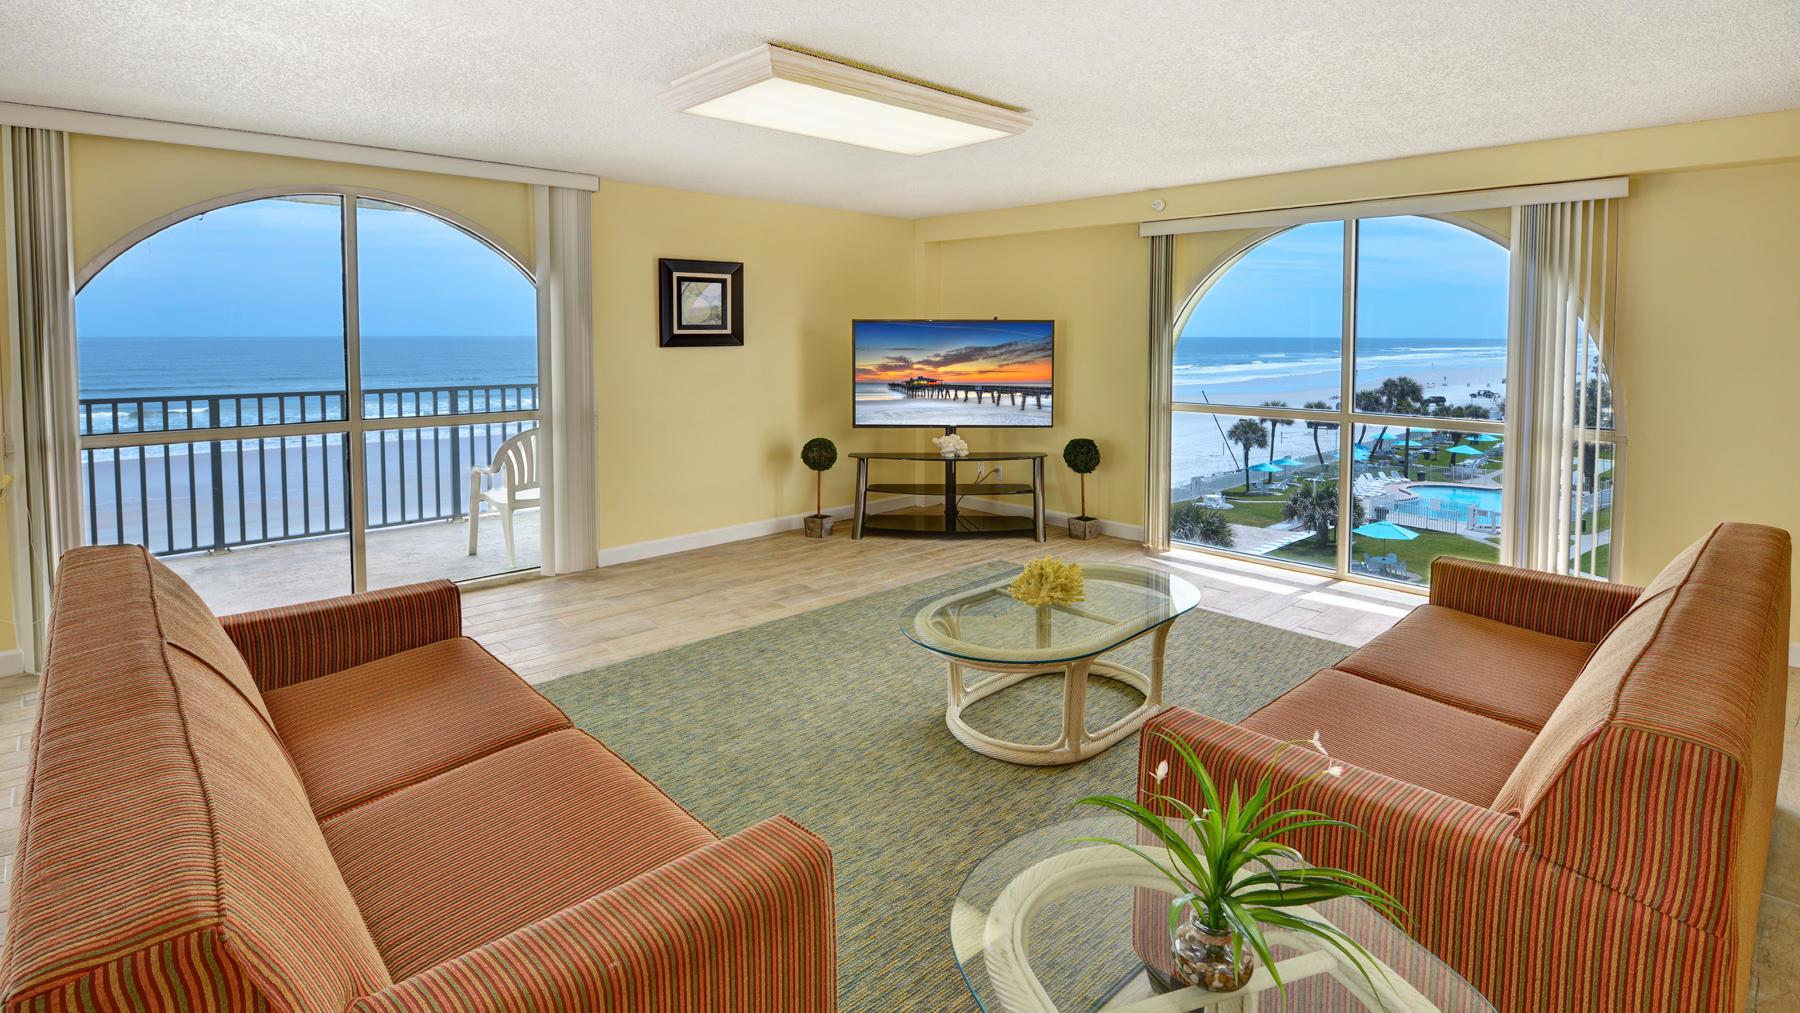 Living area of oceanview hotel room.